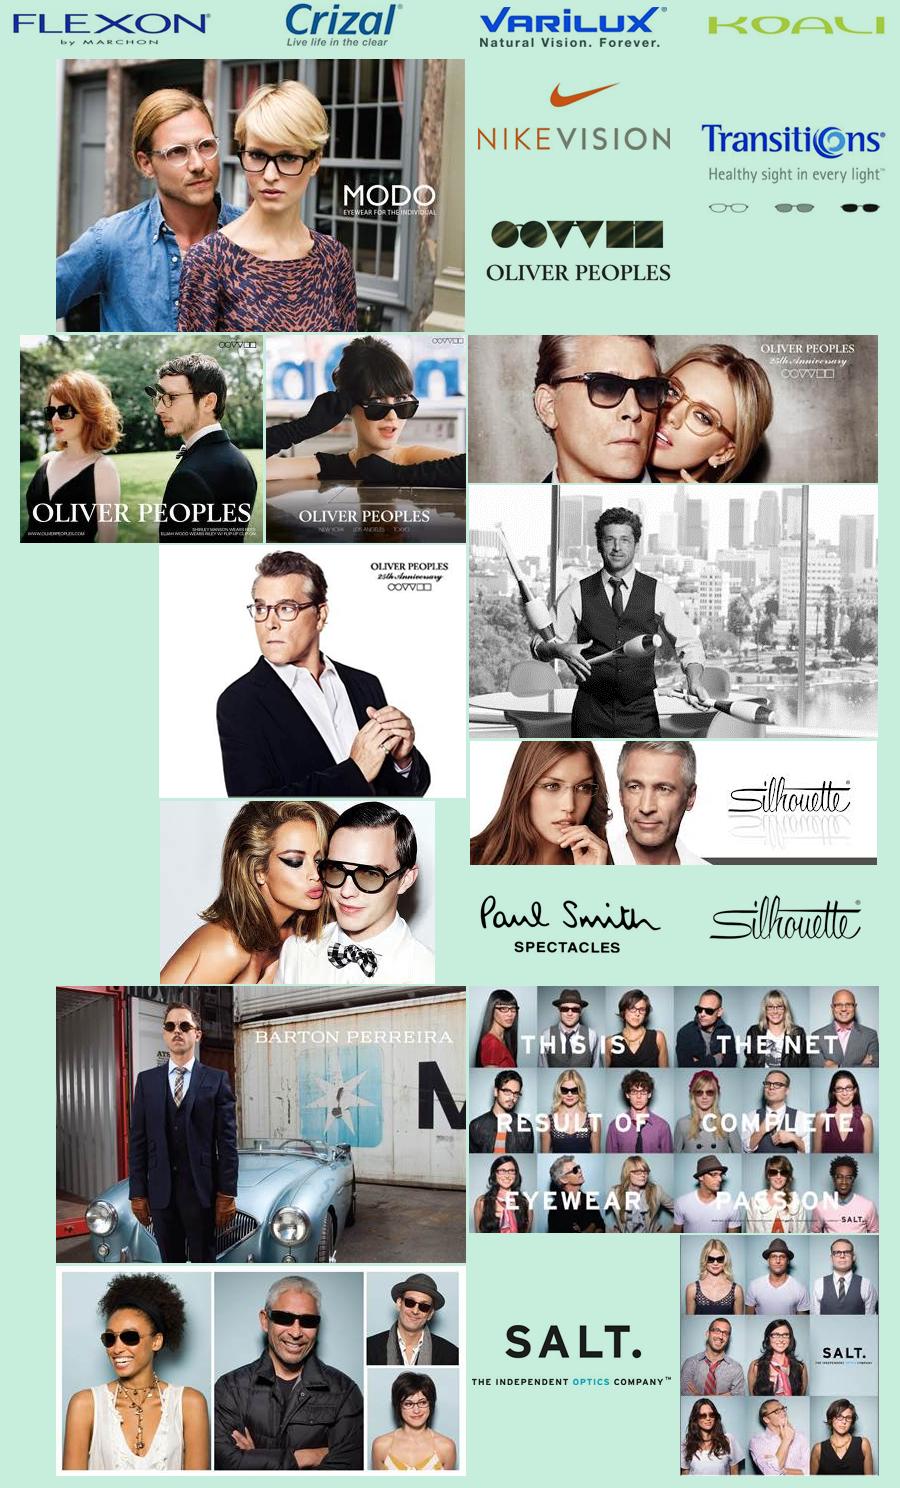 Tom Ford eyewear frames | Manhasset, NY | Dr. Kornberg & LaCorte Optometrist | 516-627-0208